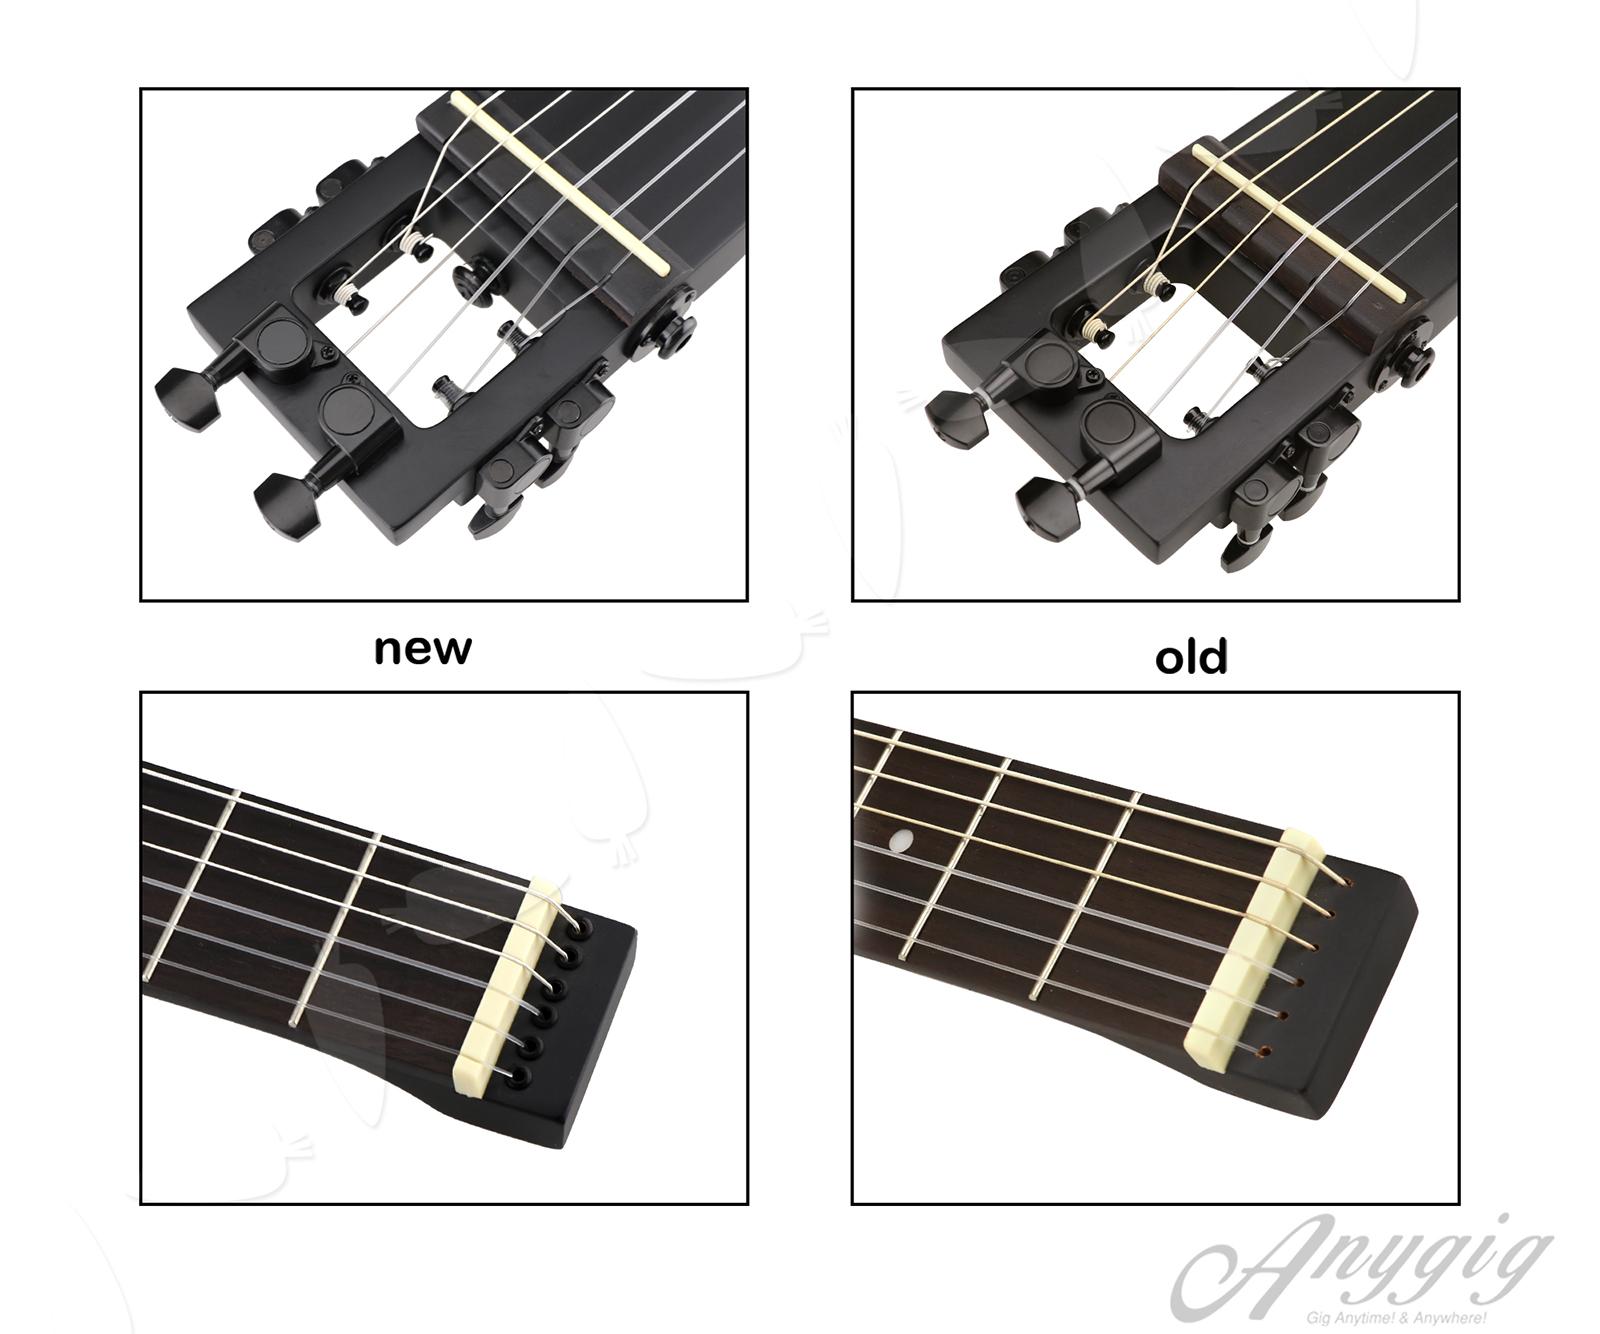 anygig agn nylon string full scale length travel guitar classical type black 735548263630 ebay. Black Bedroom Furniture Sets. Home Design Ideas